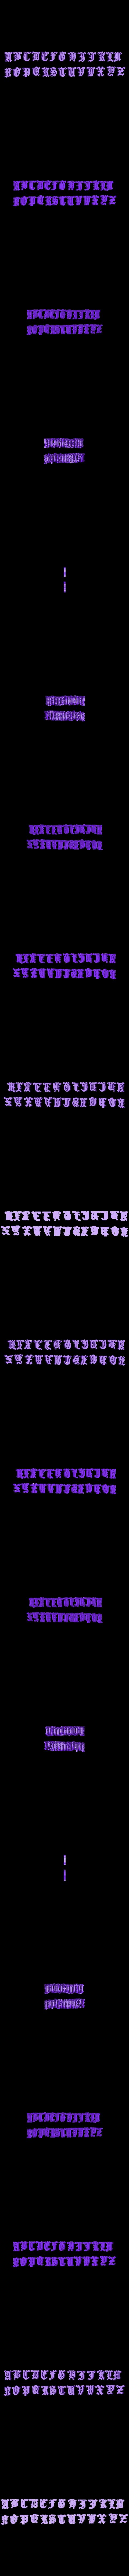 abc gothica.stl Download STL file gothic alphabet • 3D printable model, fcosaldana0210